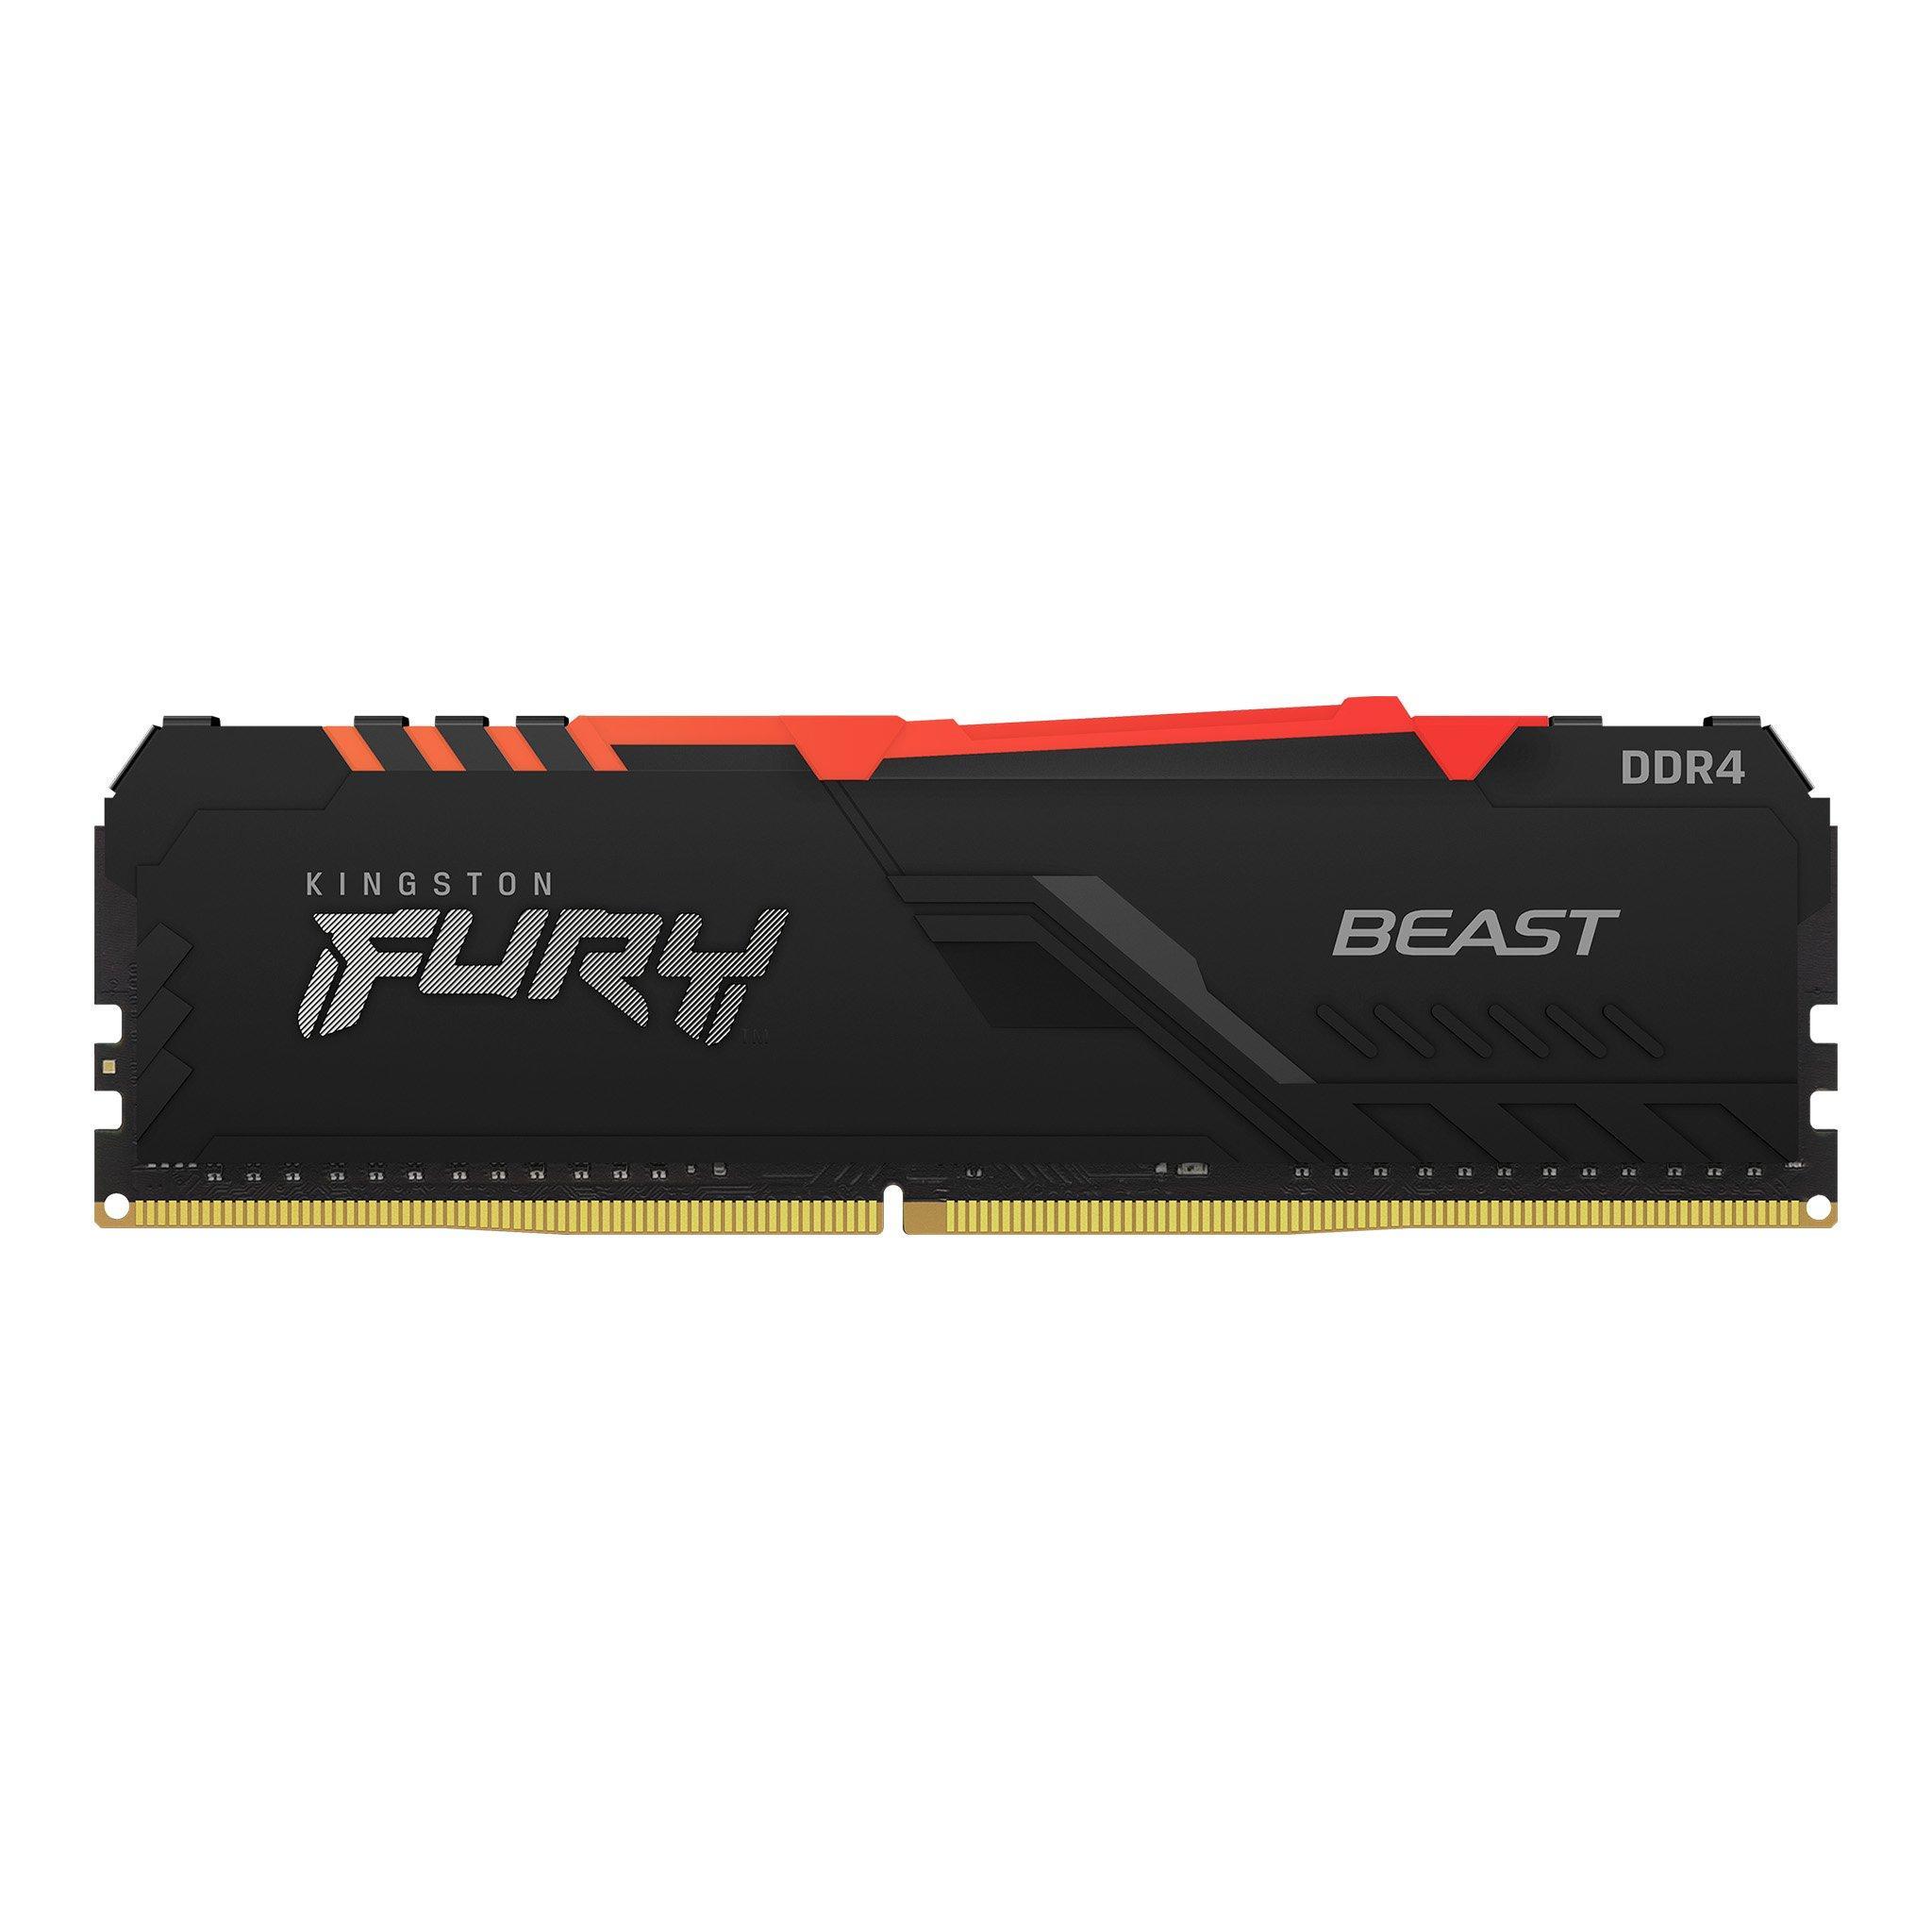 Памет Kingston FURY Beast Black RGB 8GB DDR4 PC4-21300 2666MHz CL16 KF426C16BBA/8